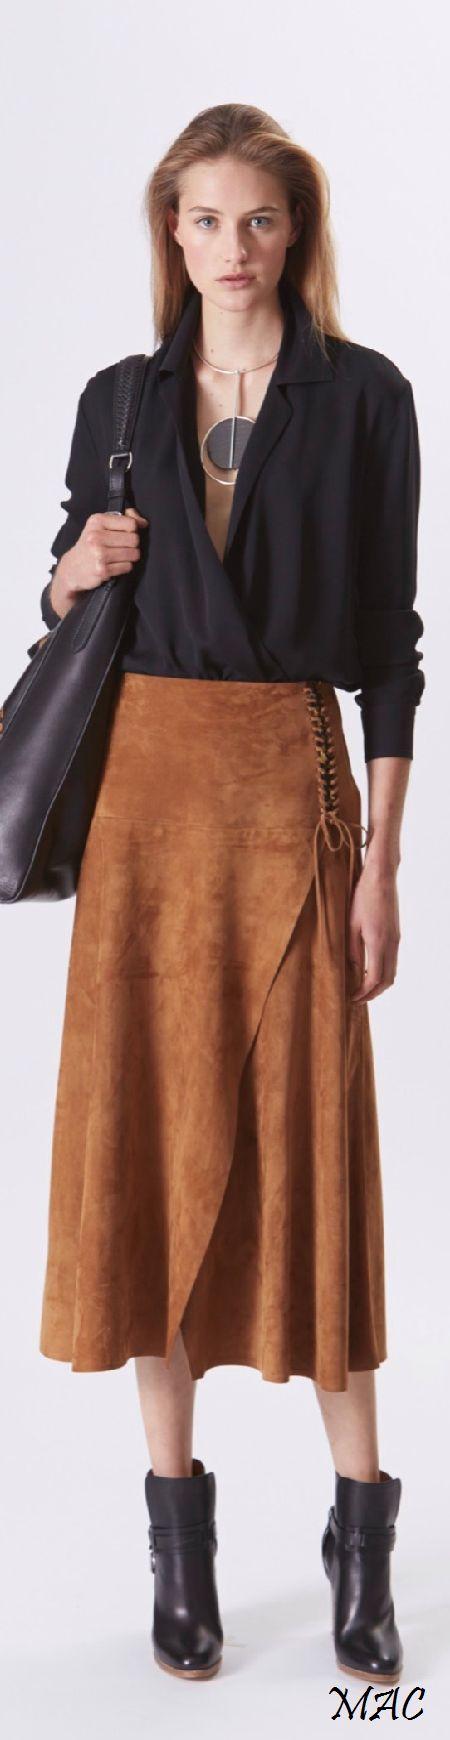 Resort 2016 Ralph Lauren women fashion outfit clothing stylish apparel @roressclothes closet ideas